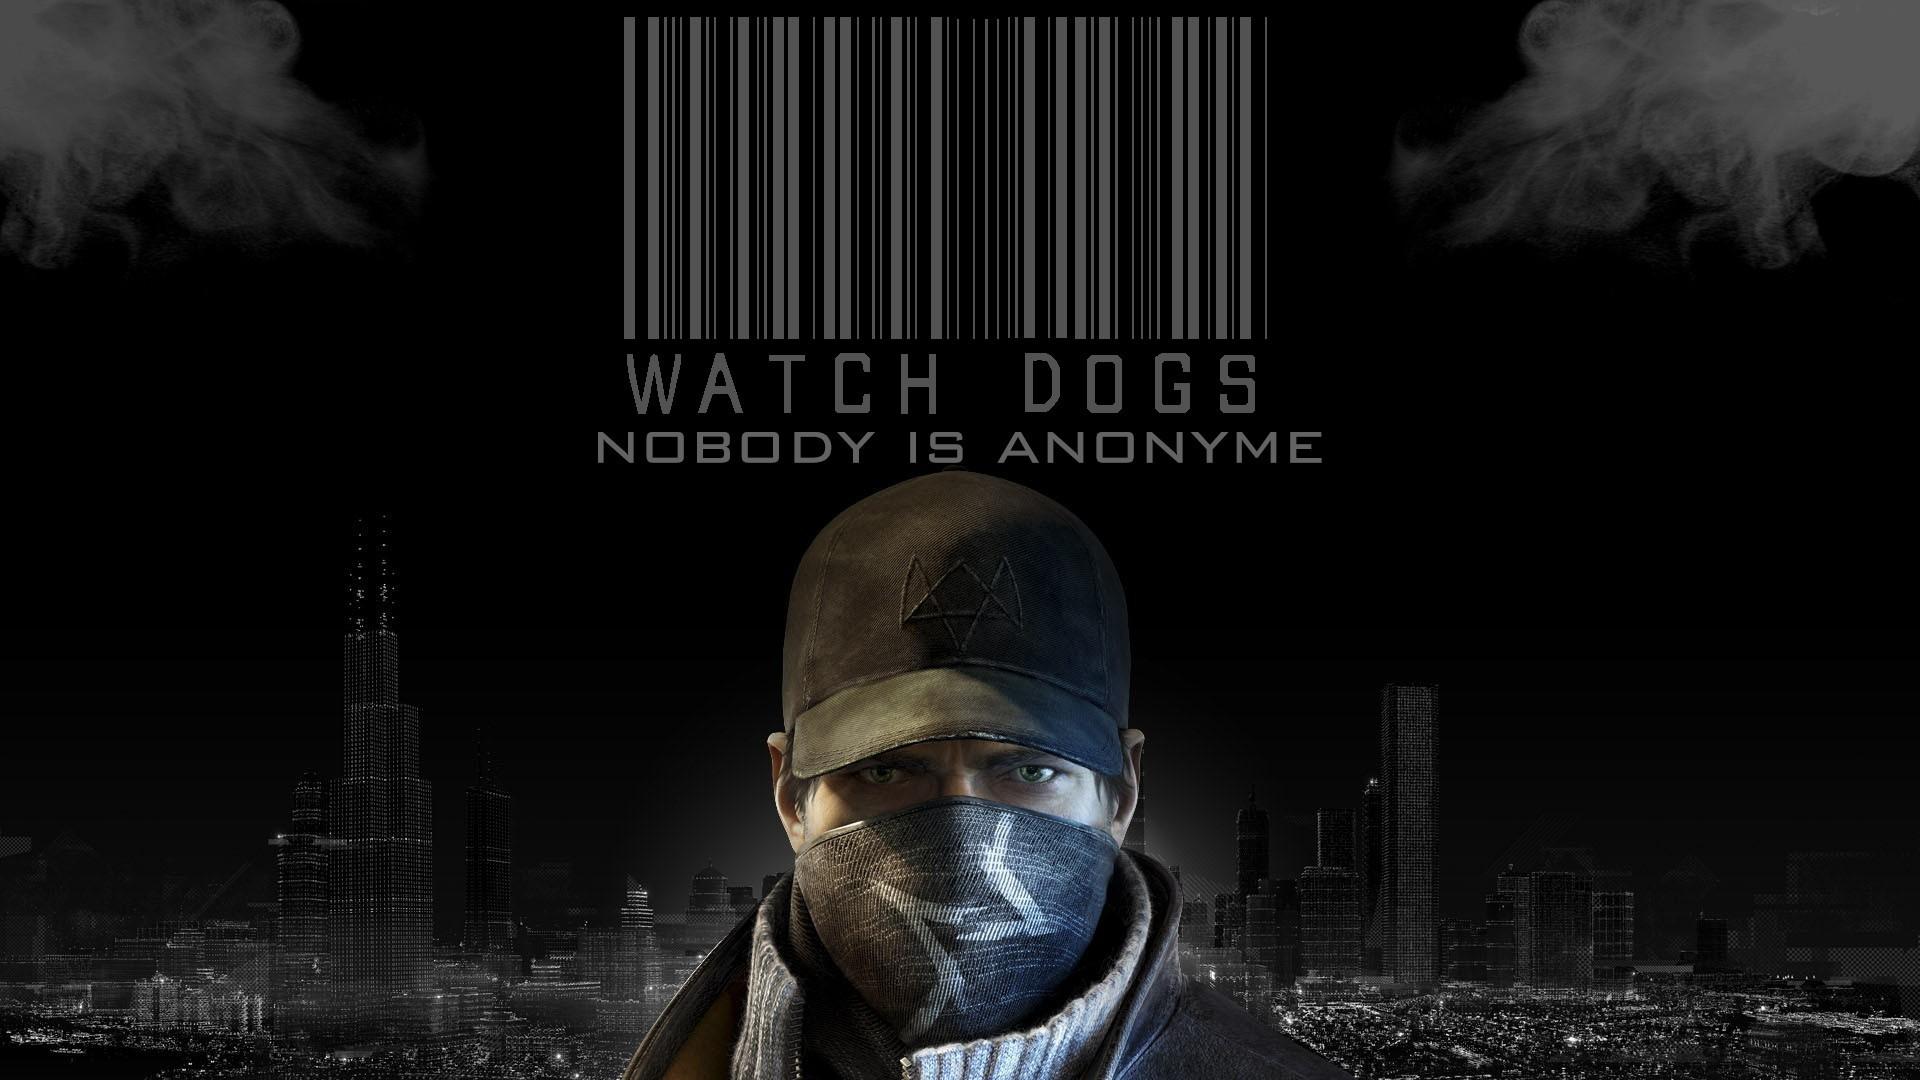 Watch Dogs Logo Game HD Wallpaper | Game HD Wallpaper | game hd